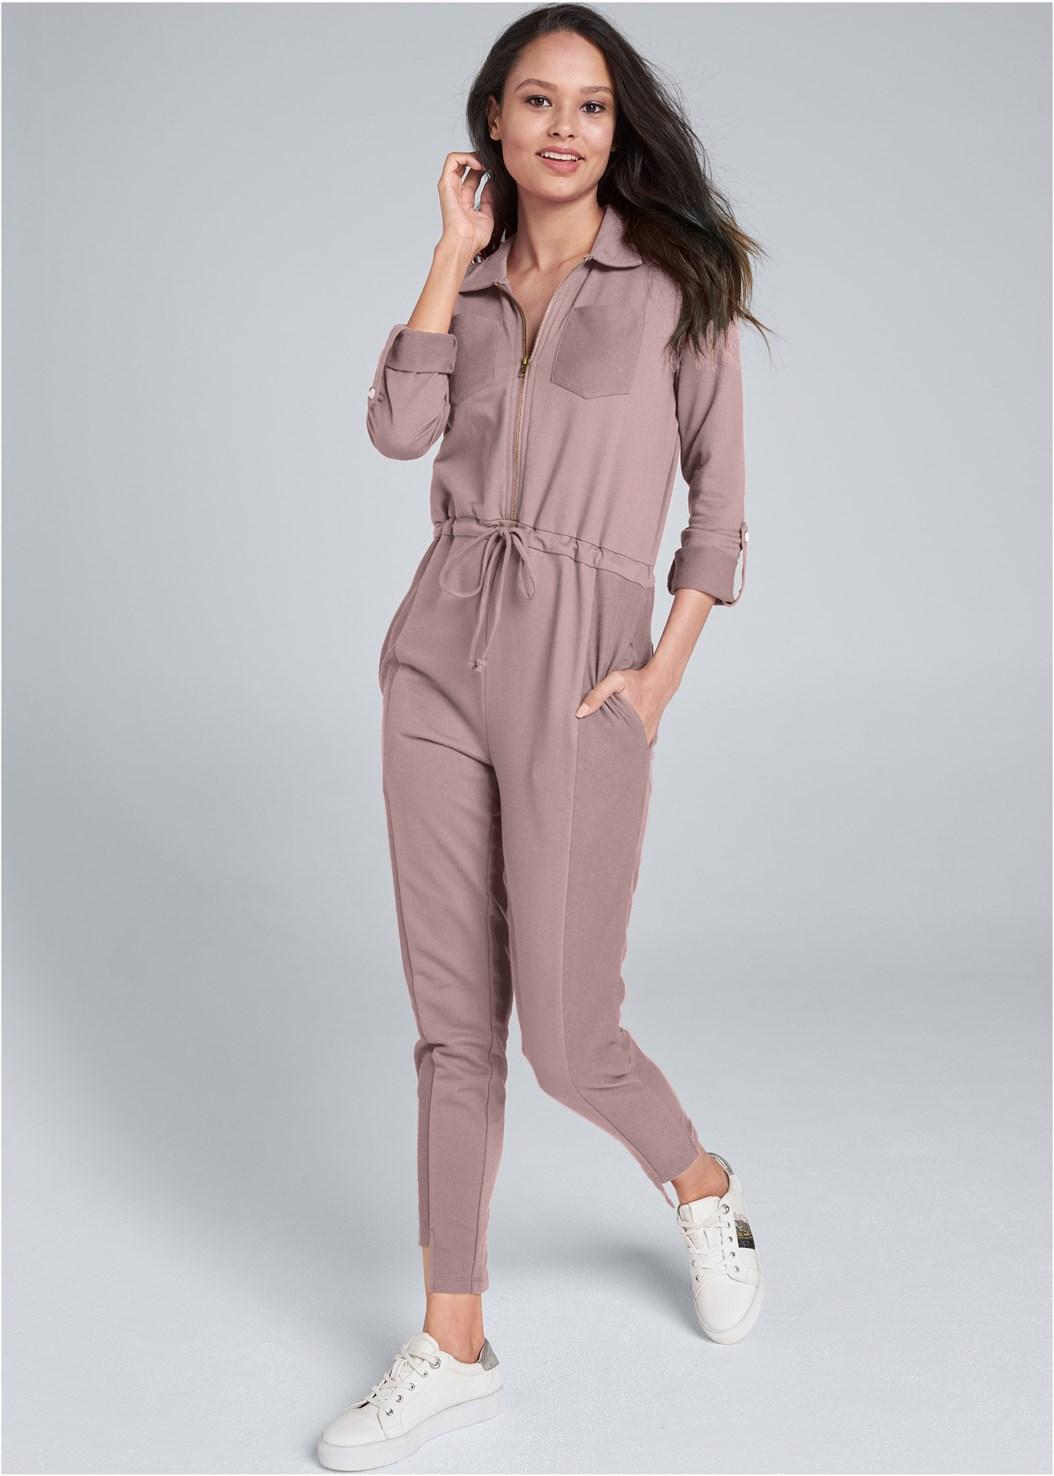 Utility Lounge Jumpsuit,Seamless Lace Comfort Bra